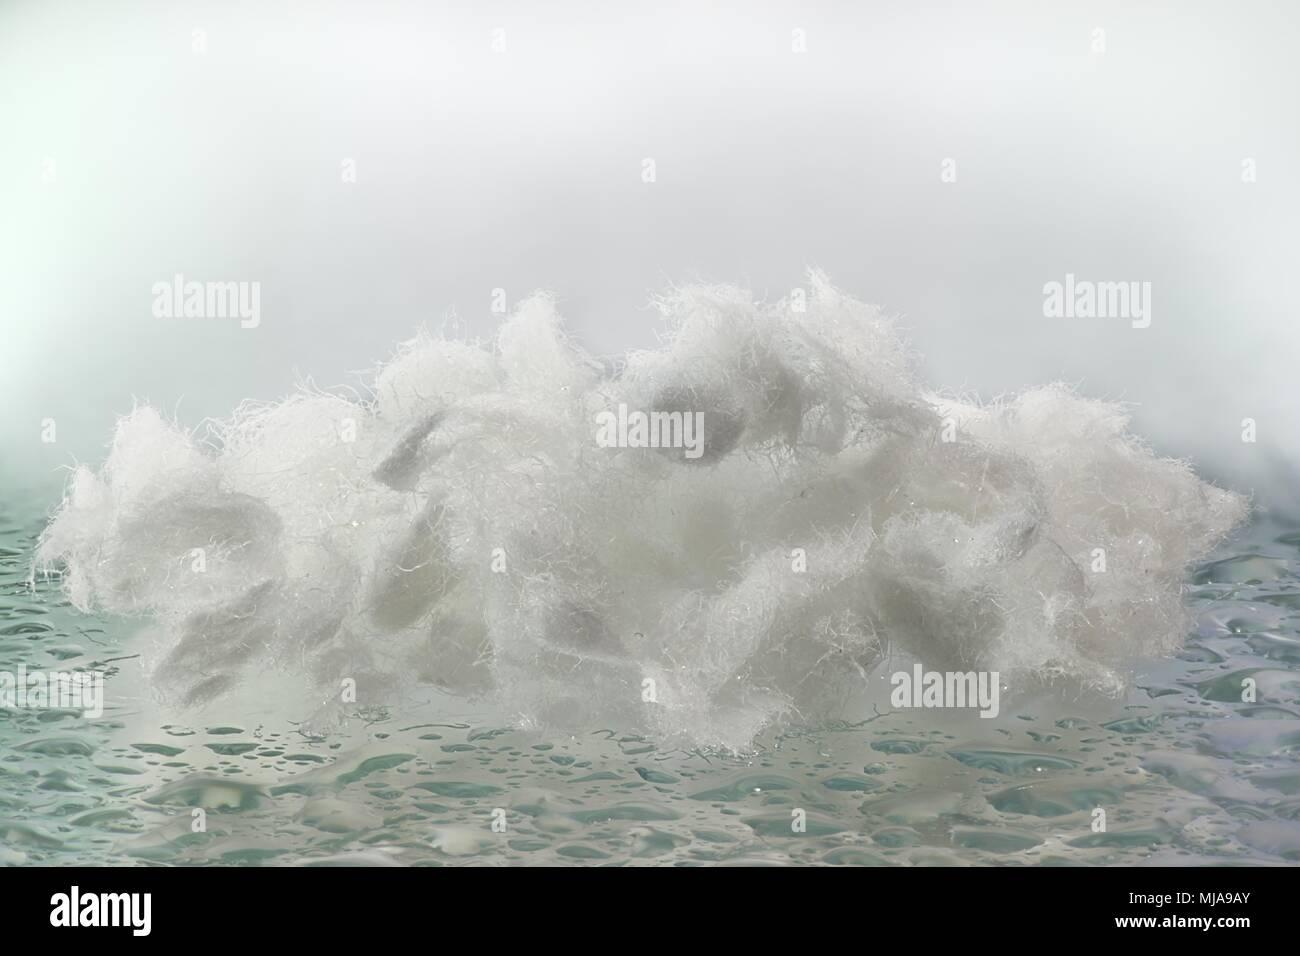 Cellulose fiber - Stock Image